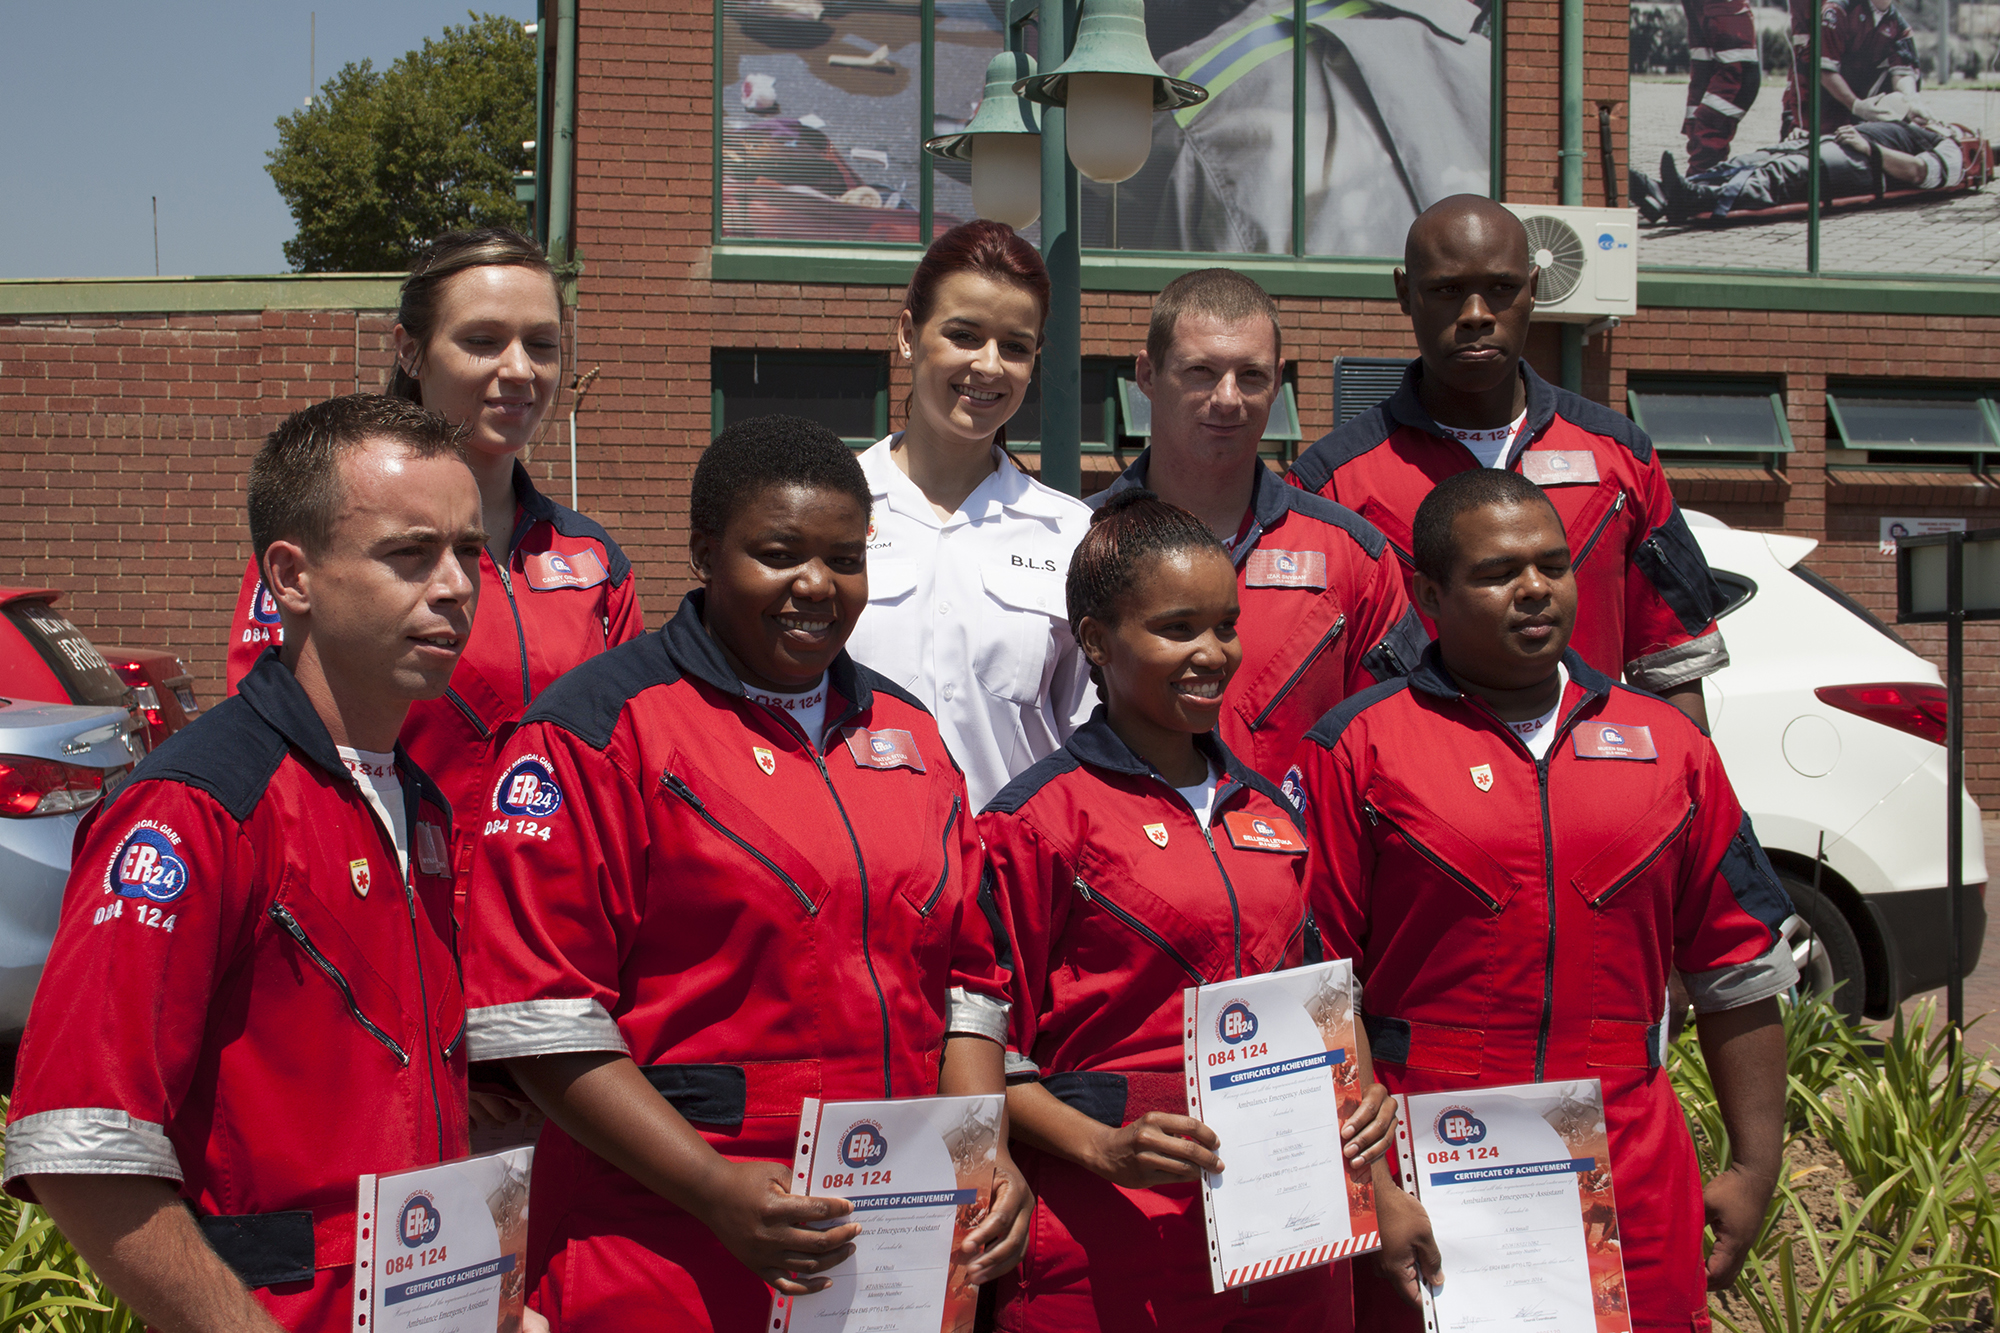 EMS-And-Ambulance-Jobs-training